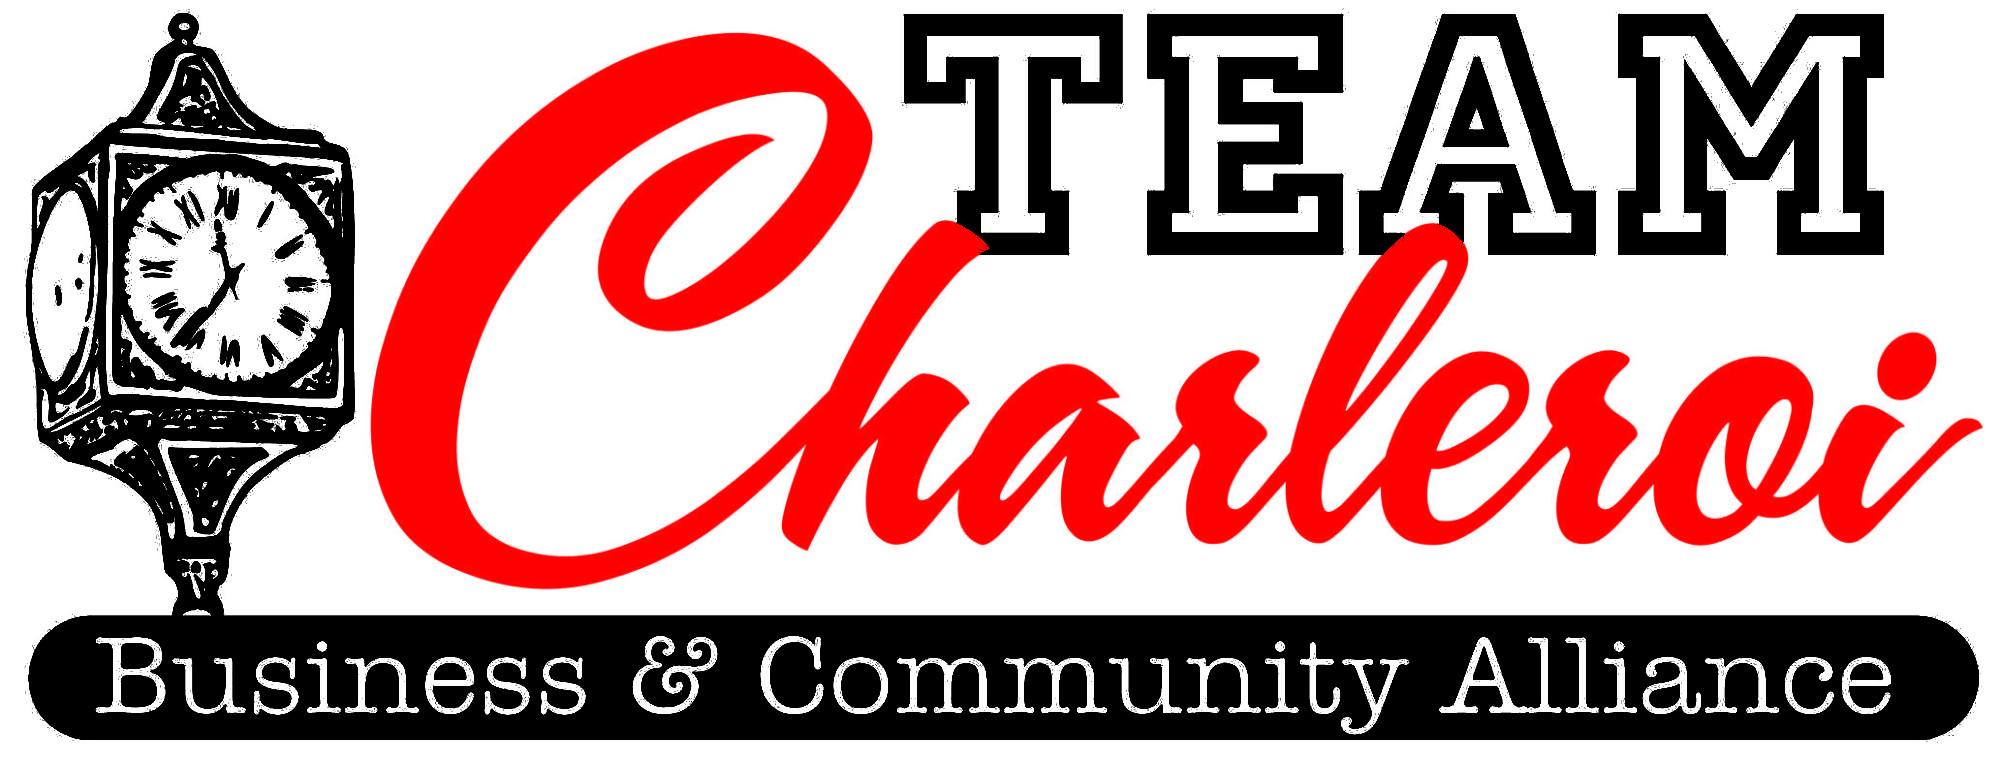 TEAM Charleroi Business & Community Alliance